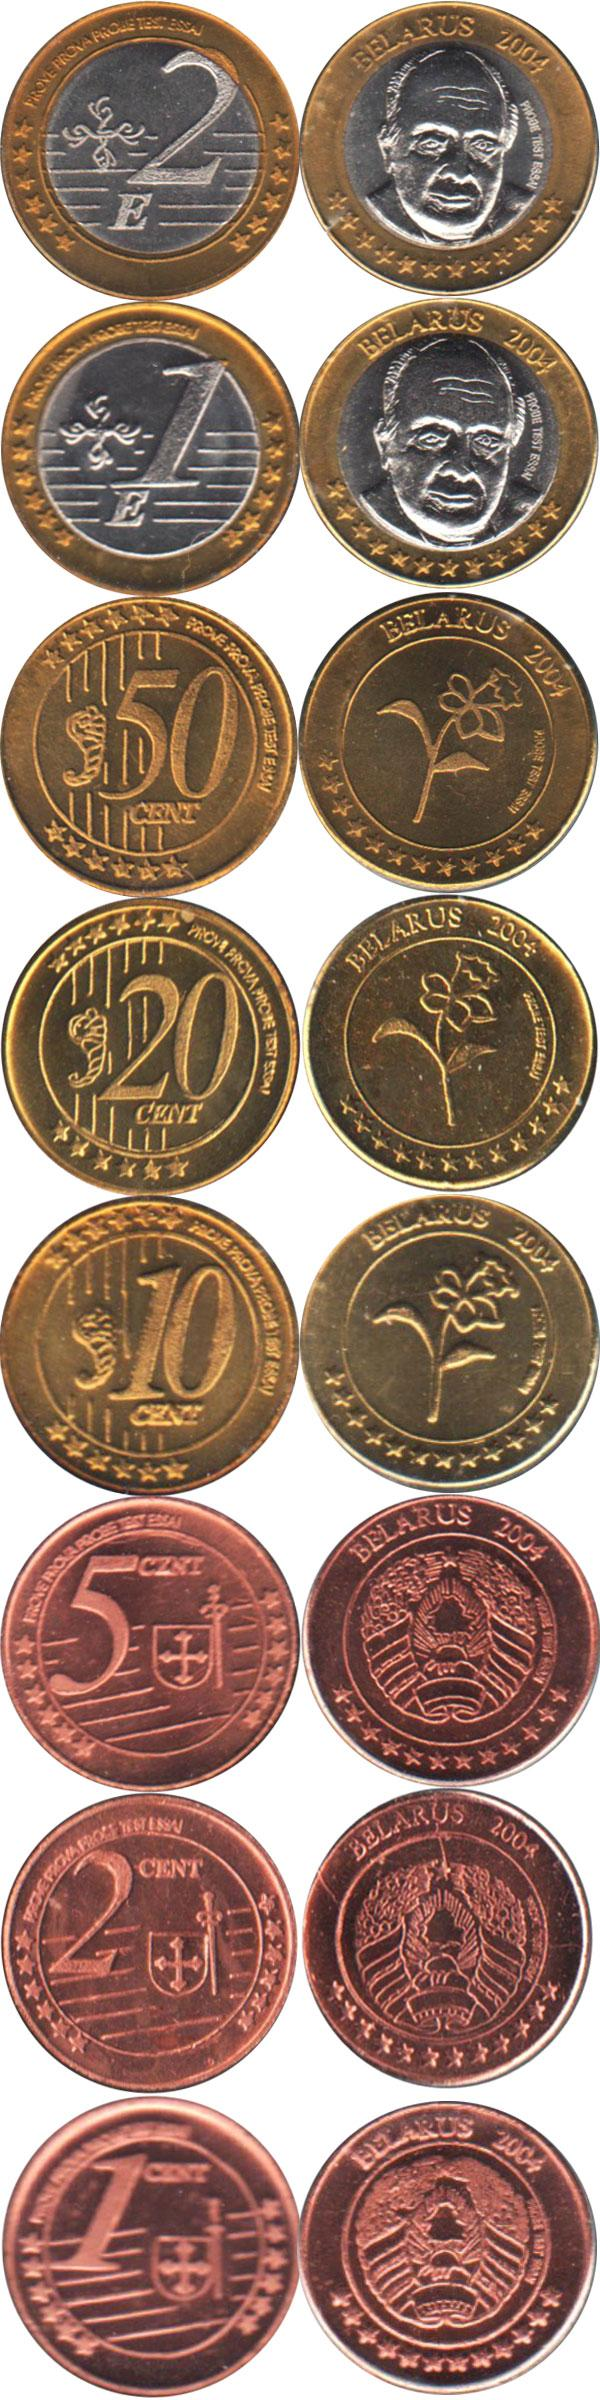 Каталог монет - Беларусь Пробник-евронабор 2004